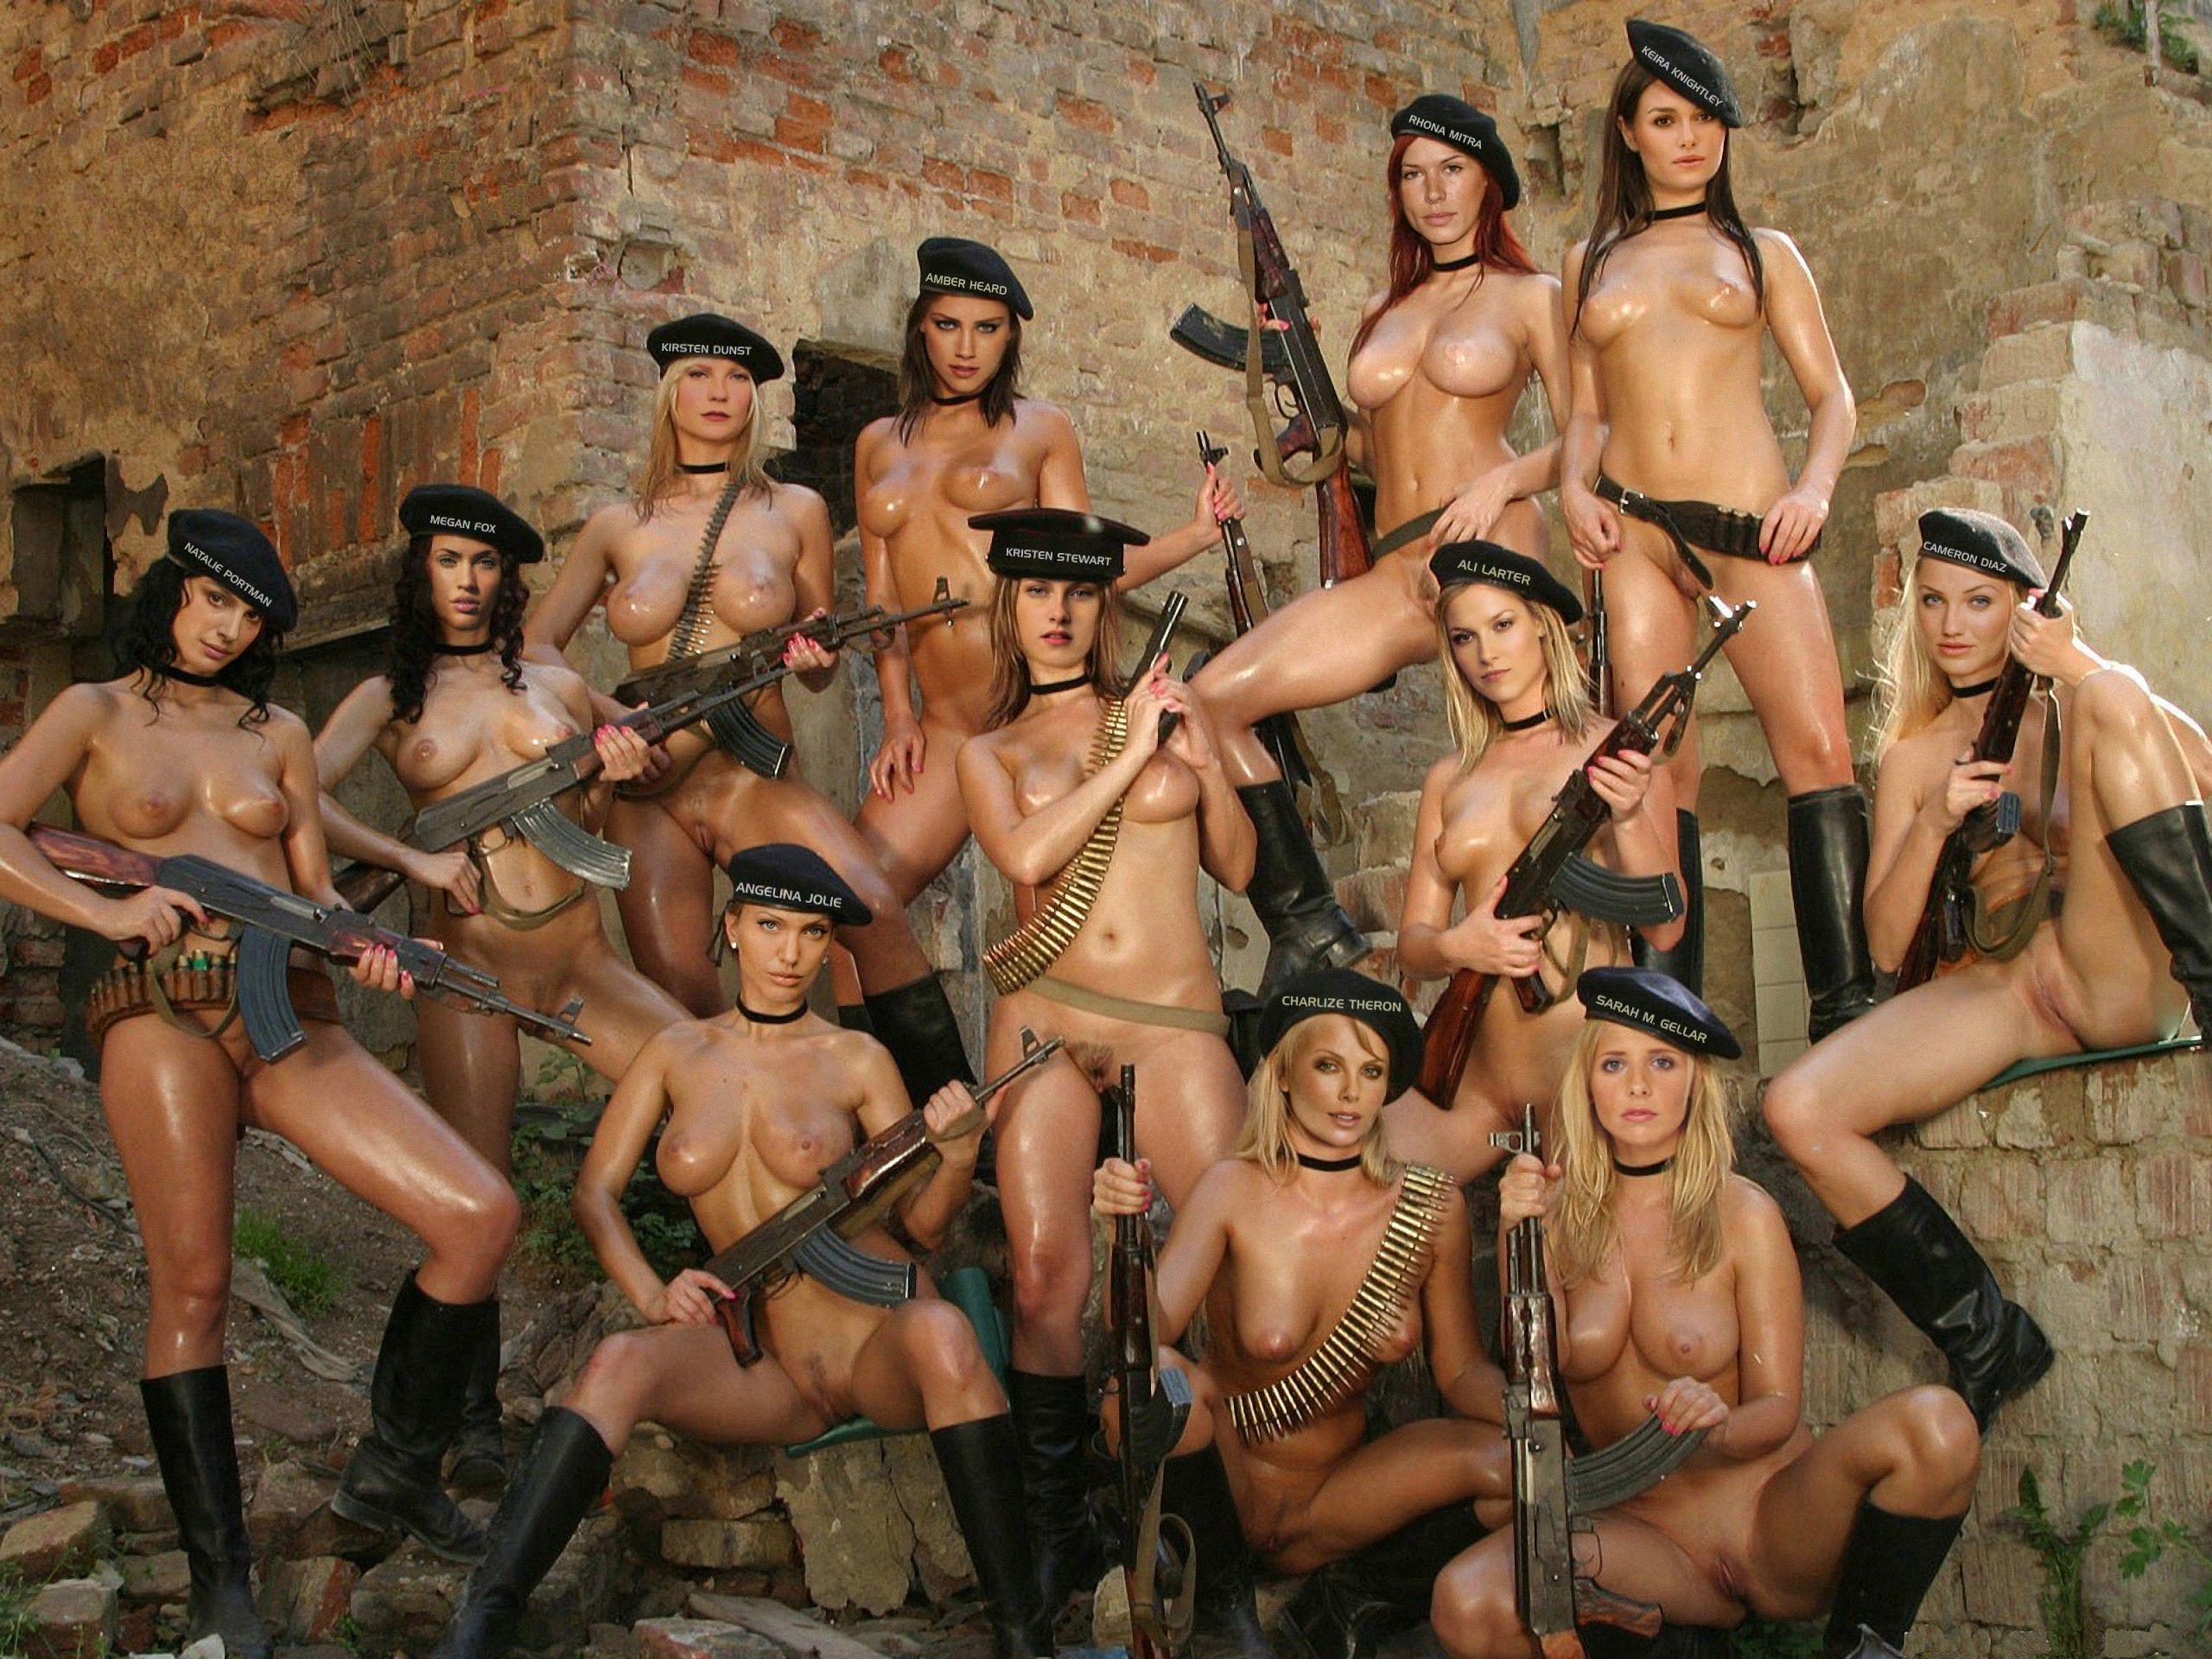 Alaskafake Porn wallpaper multi-celebrity, nude, group, fake, guns, whores